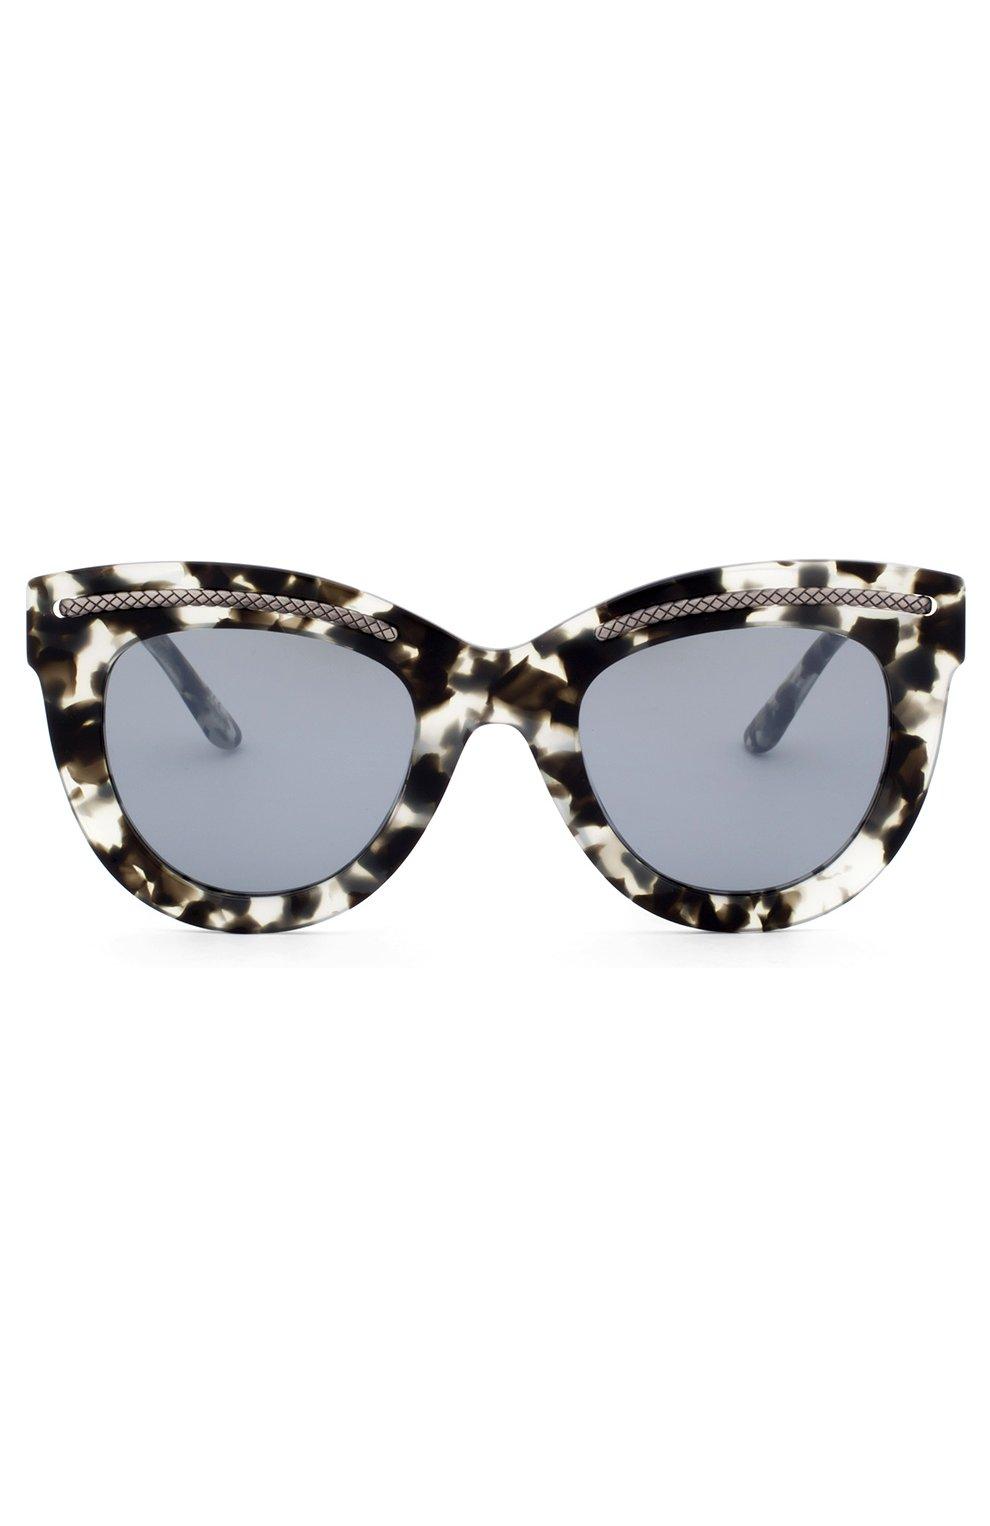 Женские солнцезащитные очки BOTTEGA VENETA хаки цвета, арт. 0030 005 | Фото 2